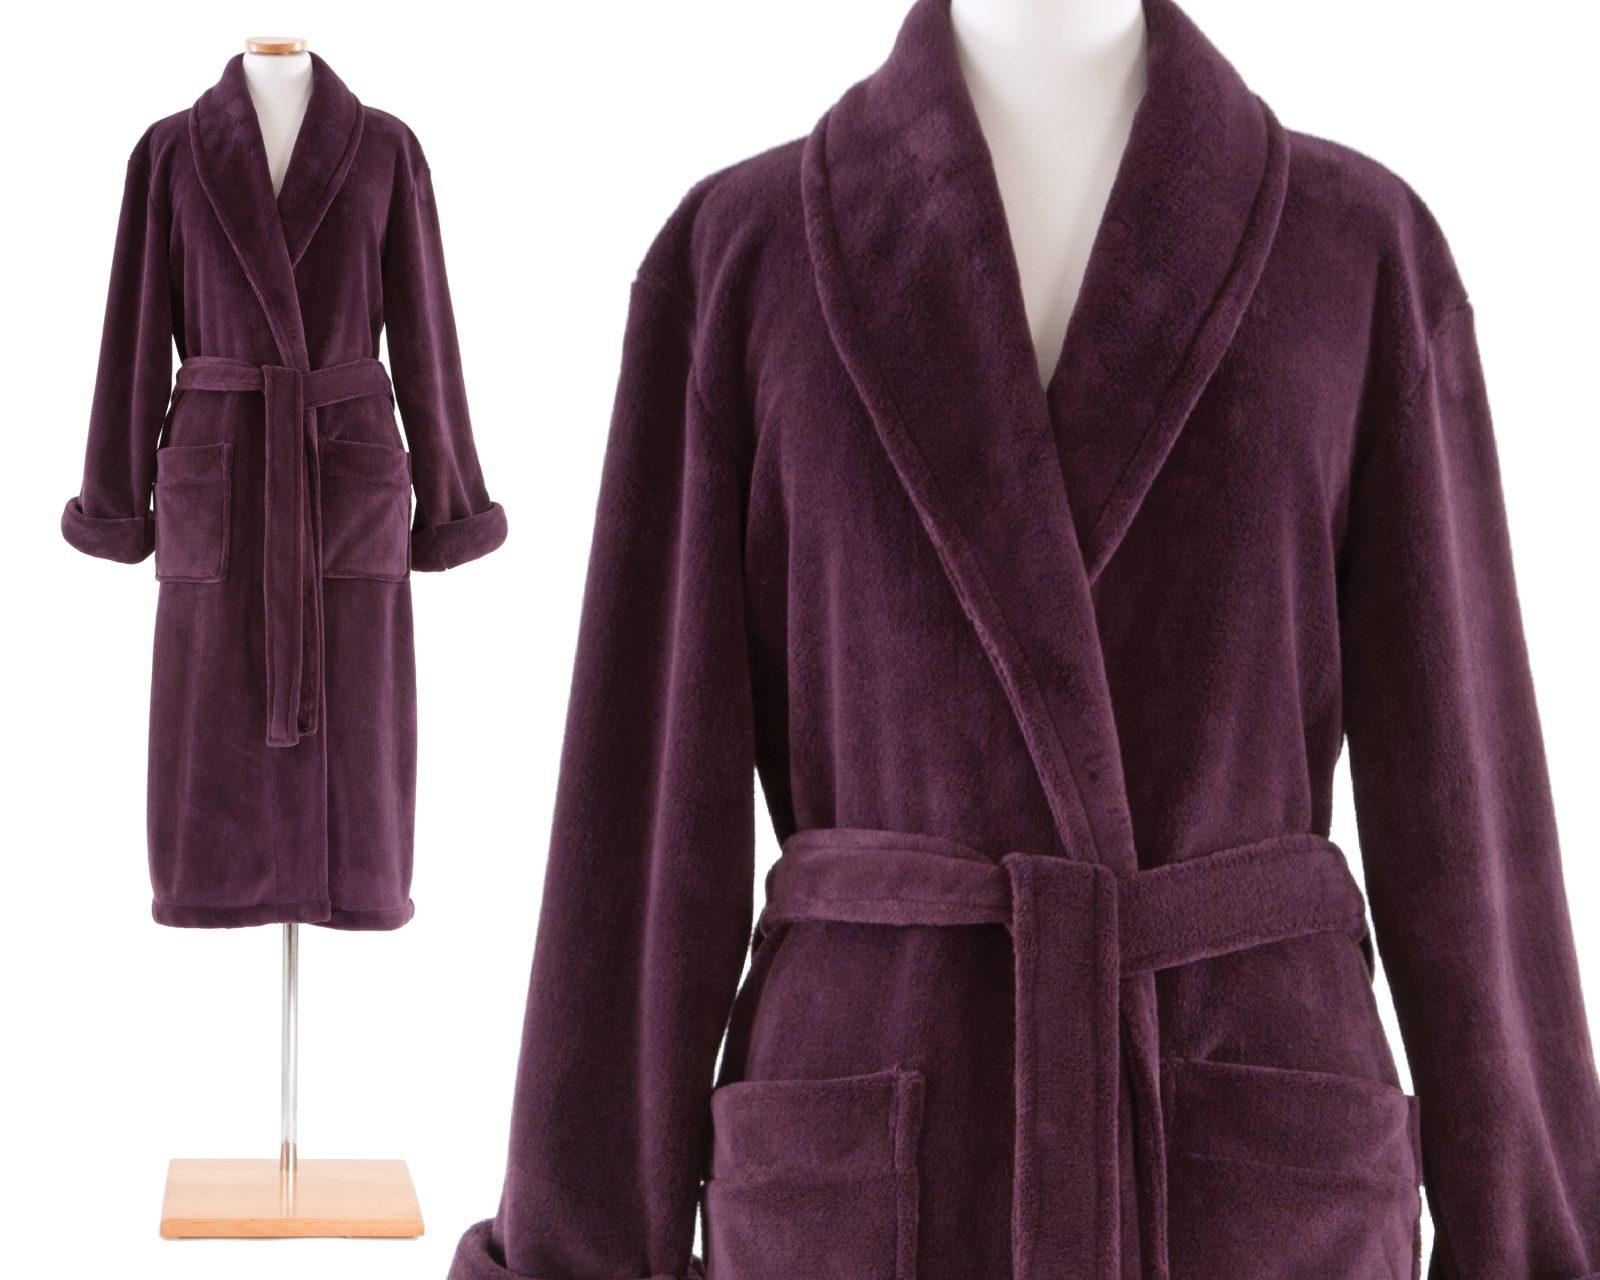 Sheepy Fleece Robe By Pine Cone Hill